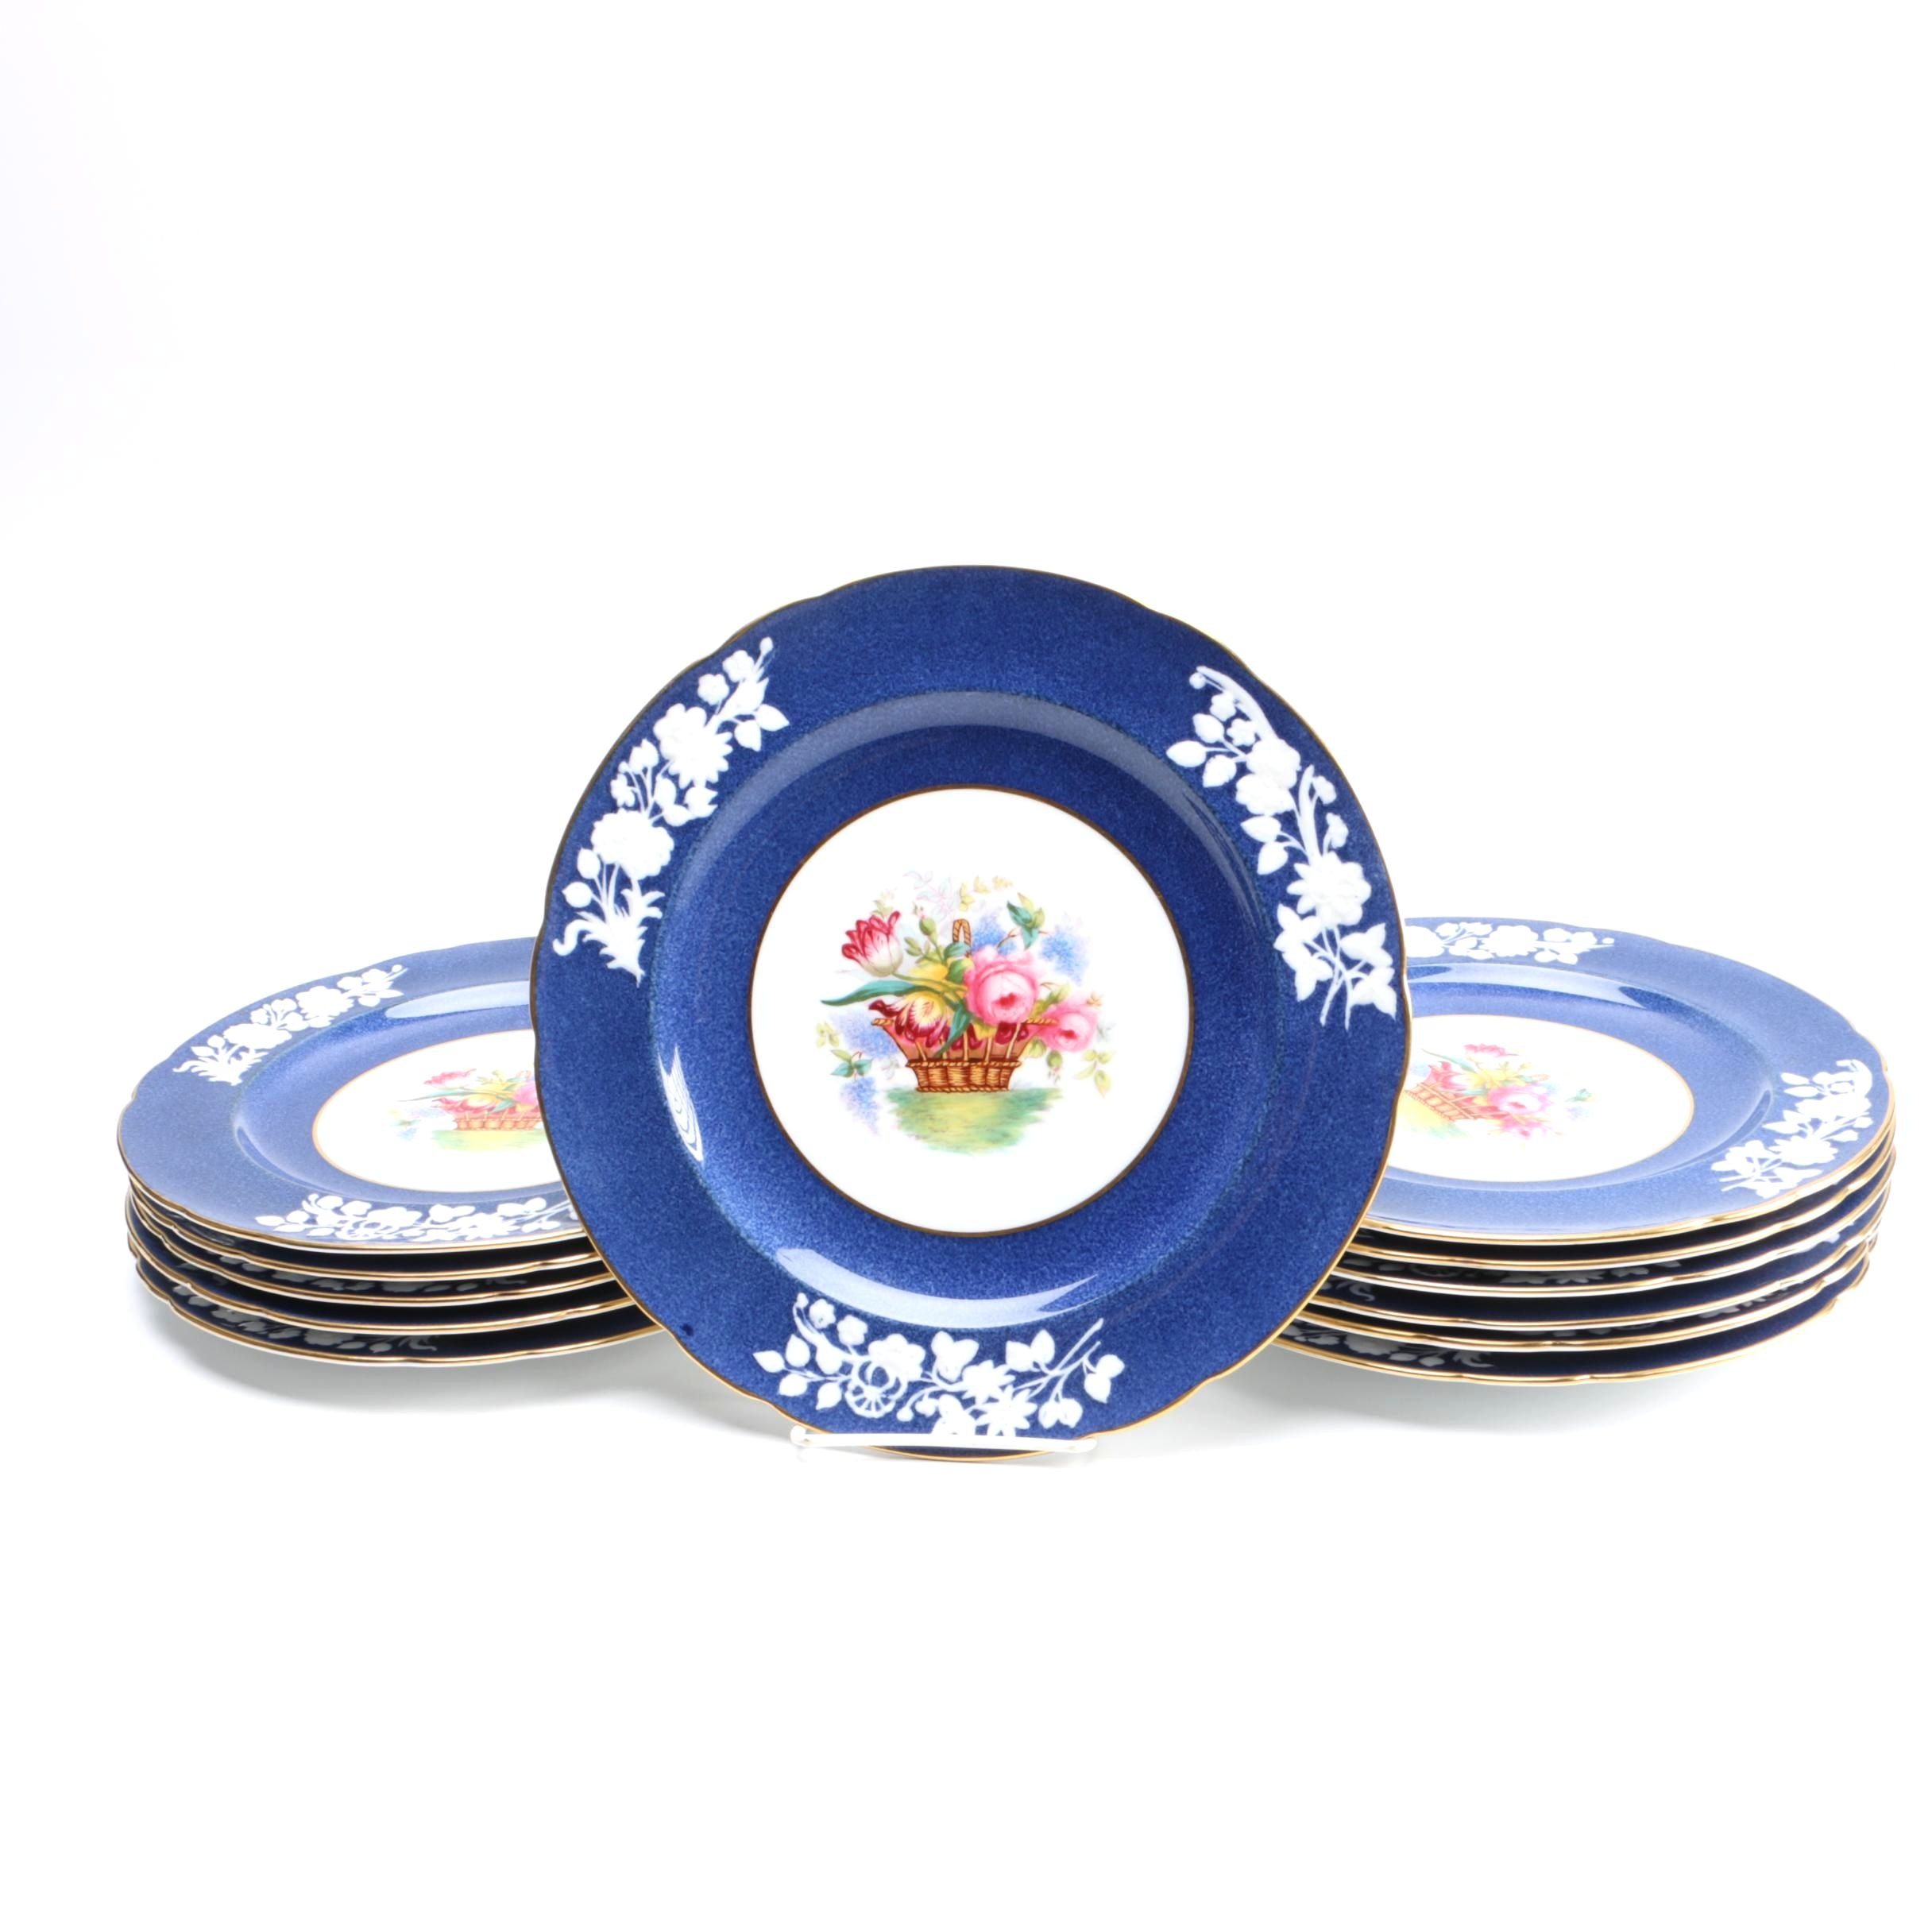 Antique Copeland Spode Porcelain Dinner Plates